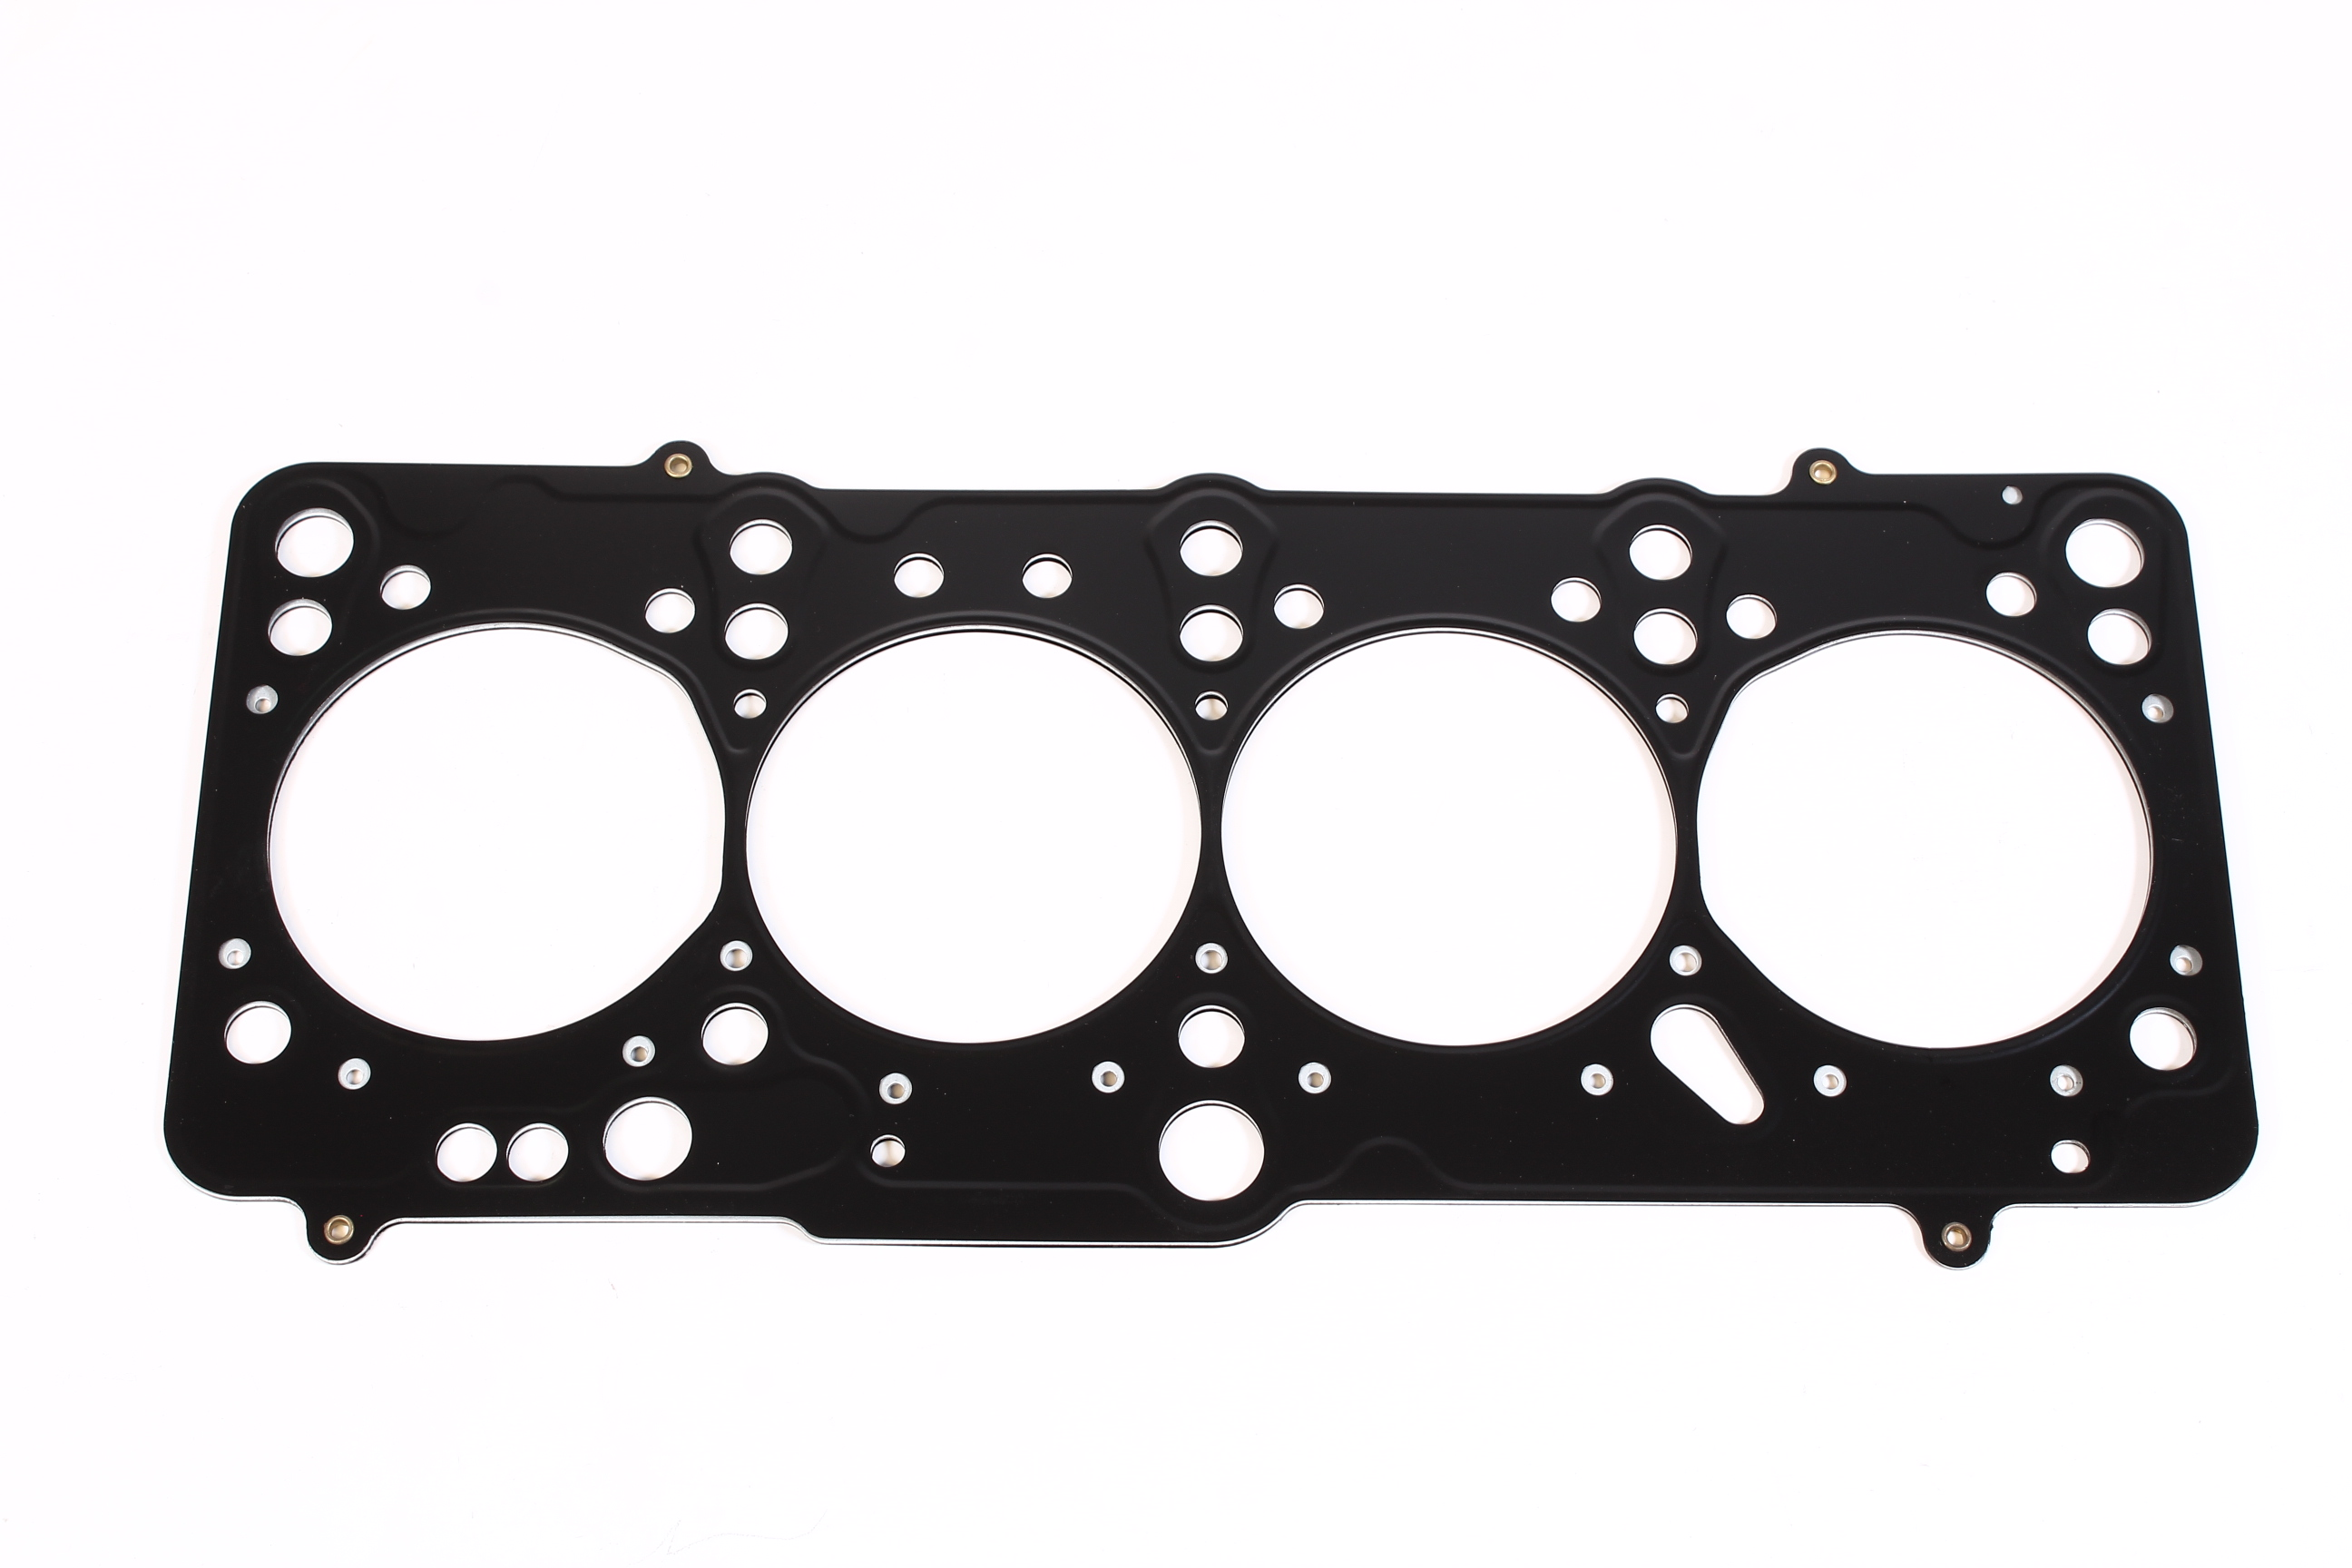 Zylinderkopfdichtung ZKD Audi A8 3,7 AKC AQG BFL links 077103383BS NEU